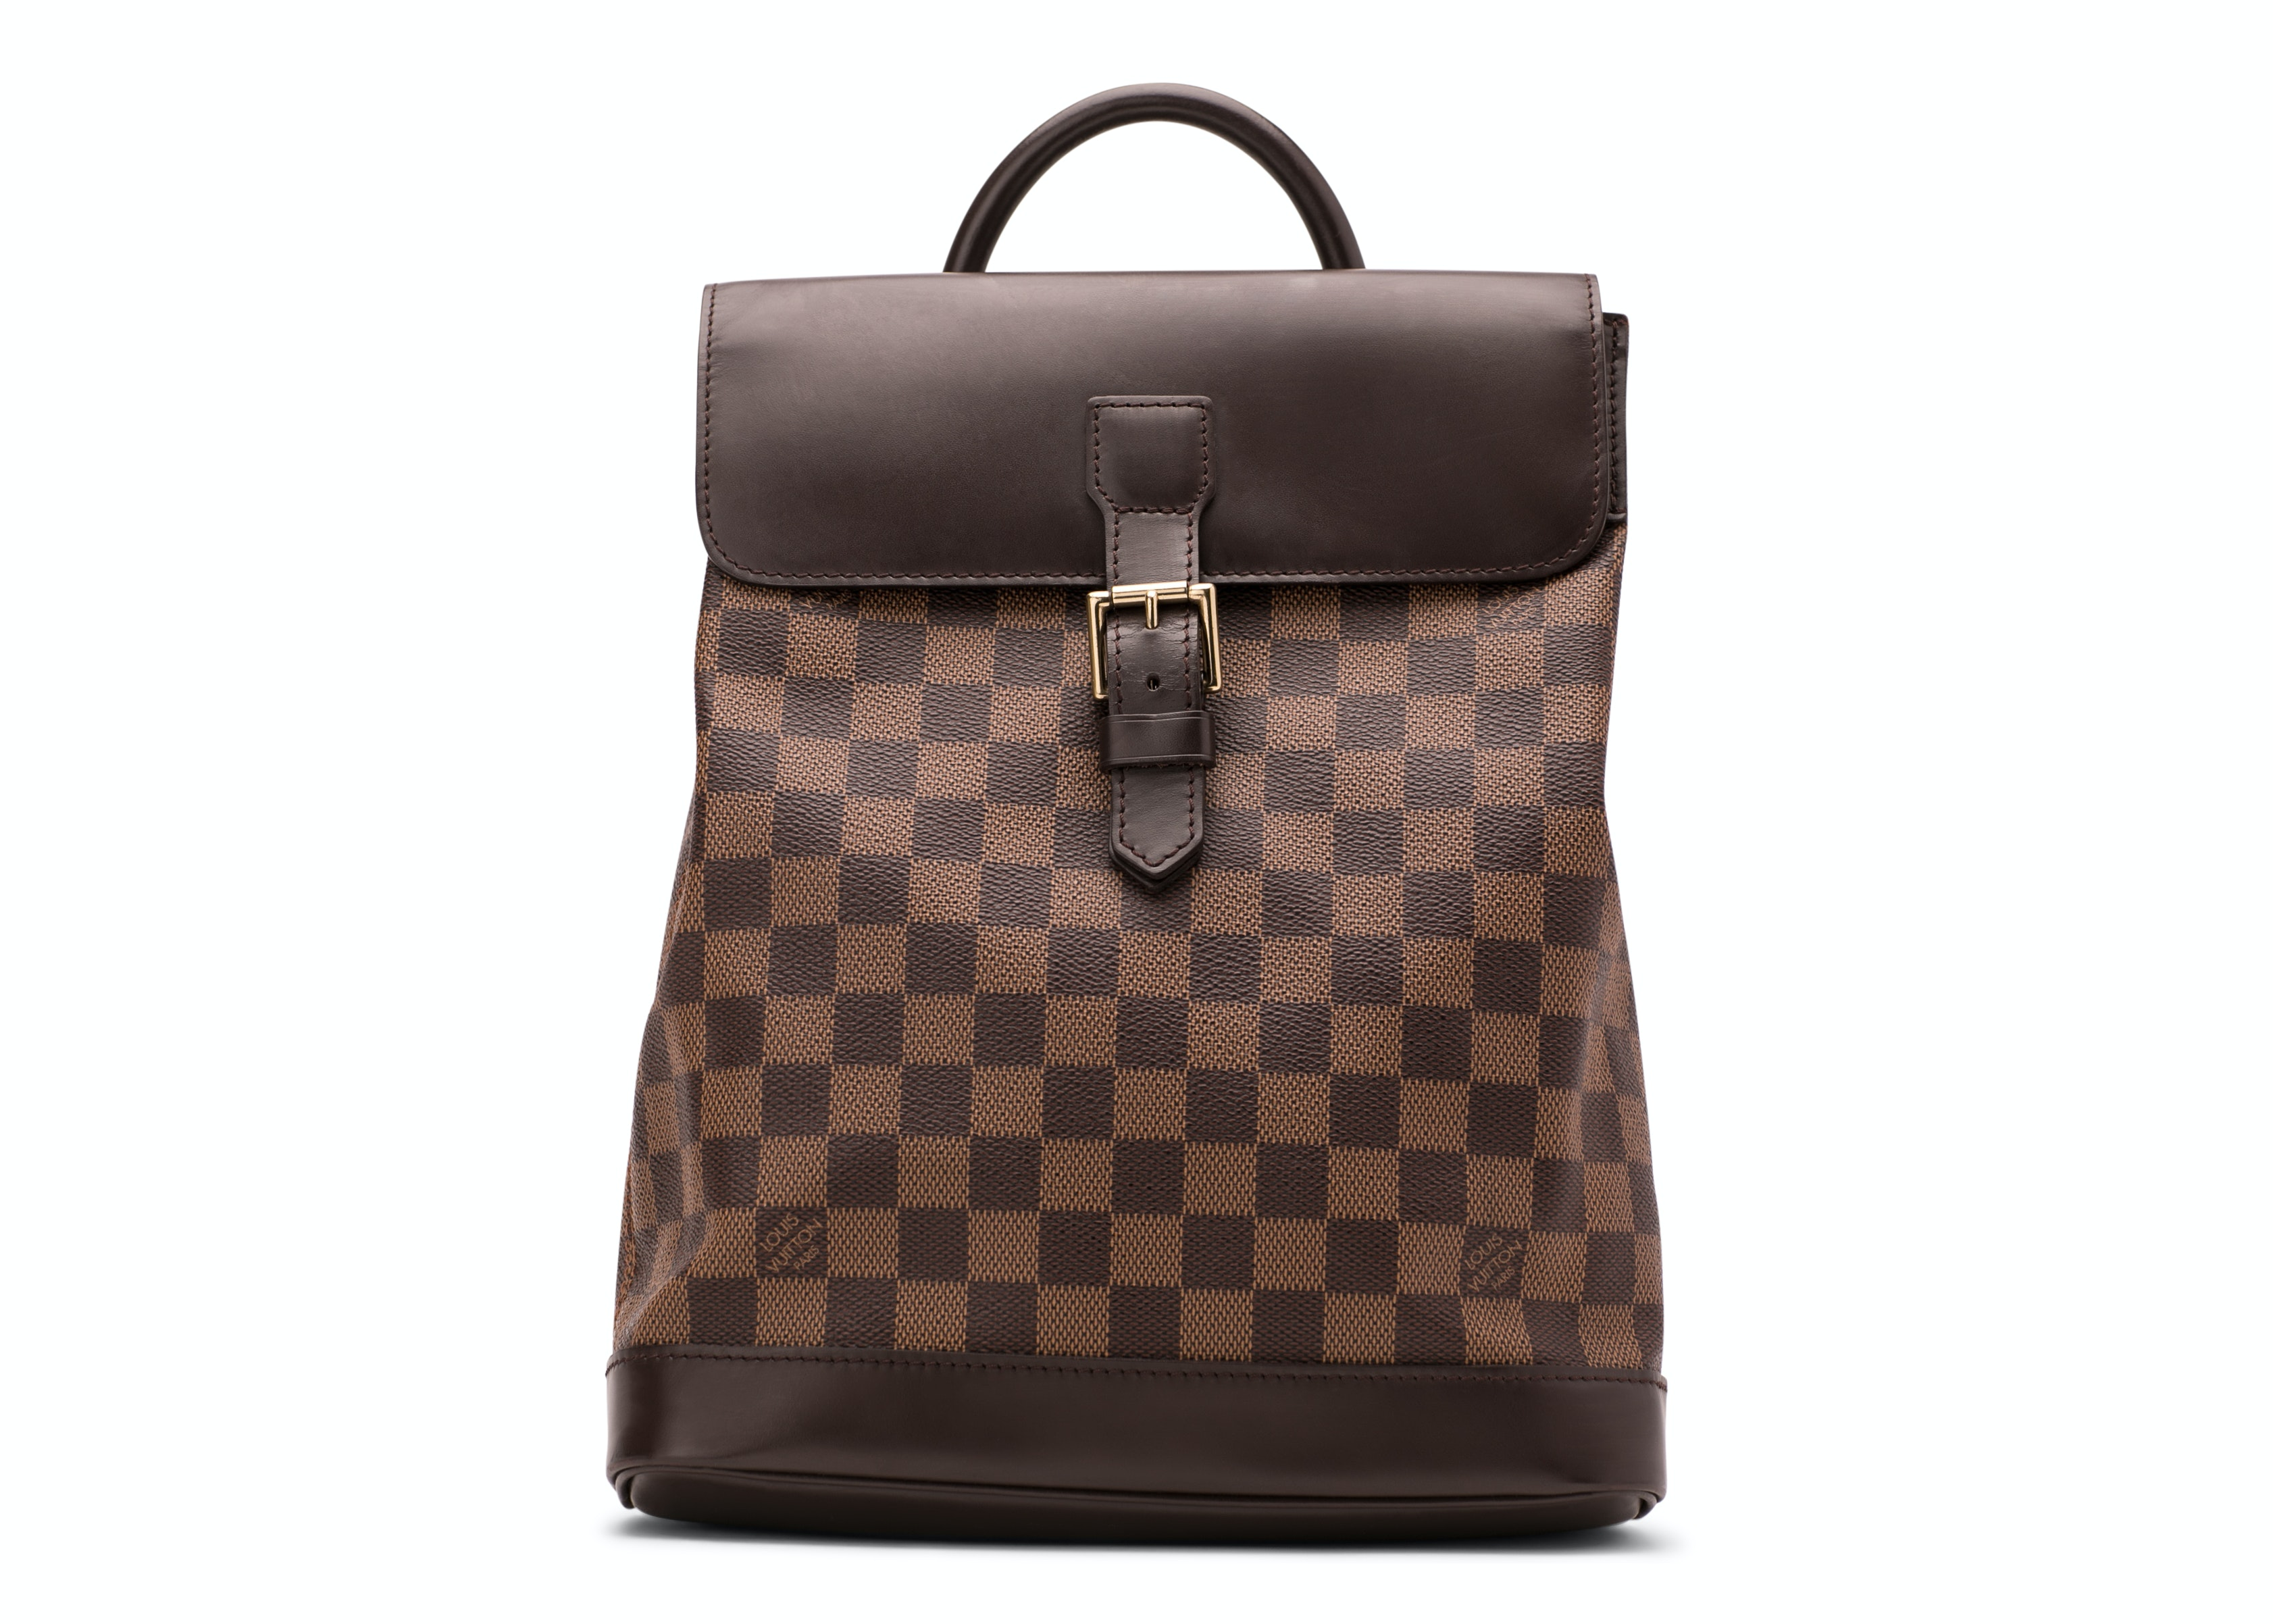 Louis Vuitton Soho Damier Ebene Brown